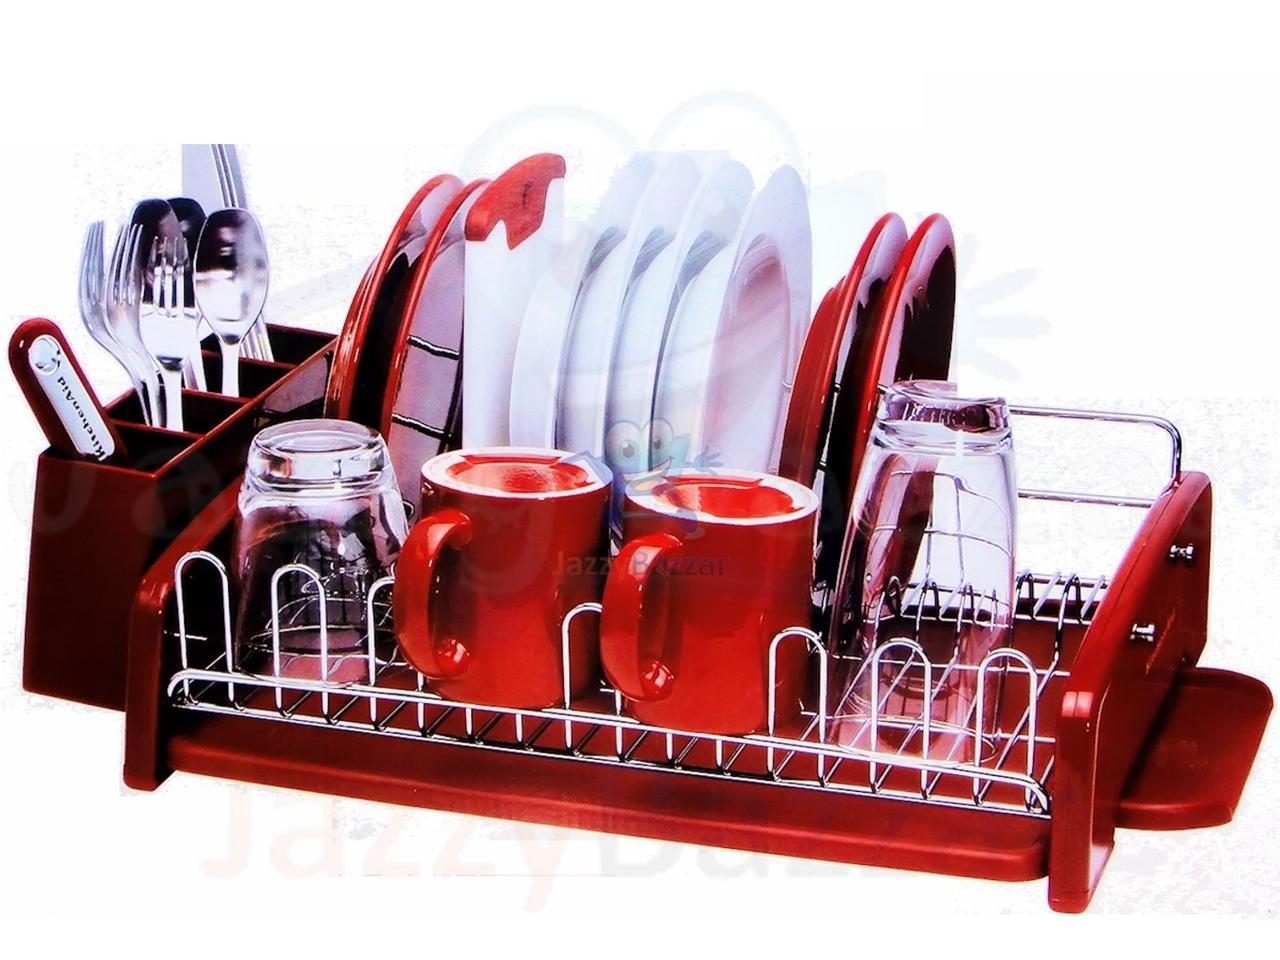 Kitchenaid Dish Rack Deptiscom Gt Inspirierendes Design